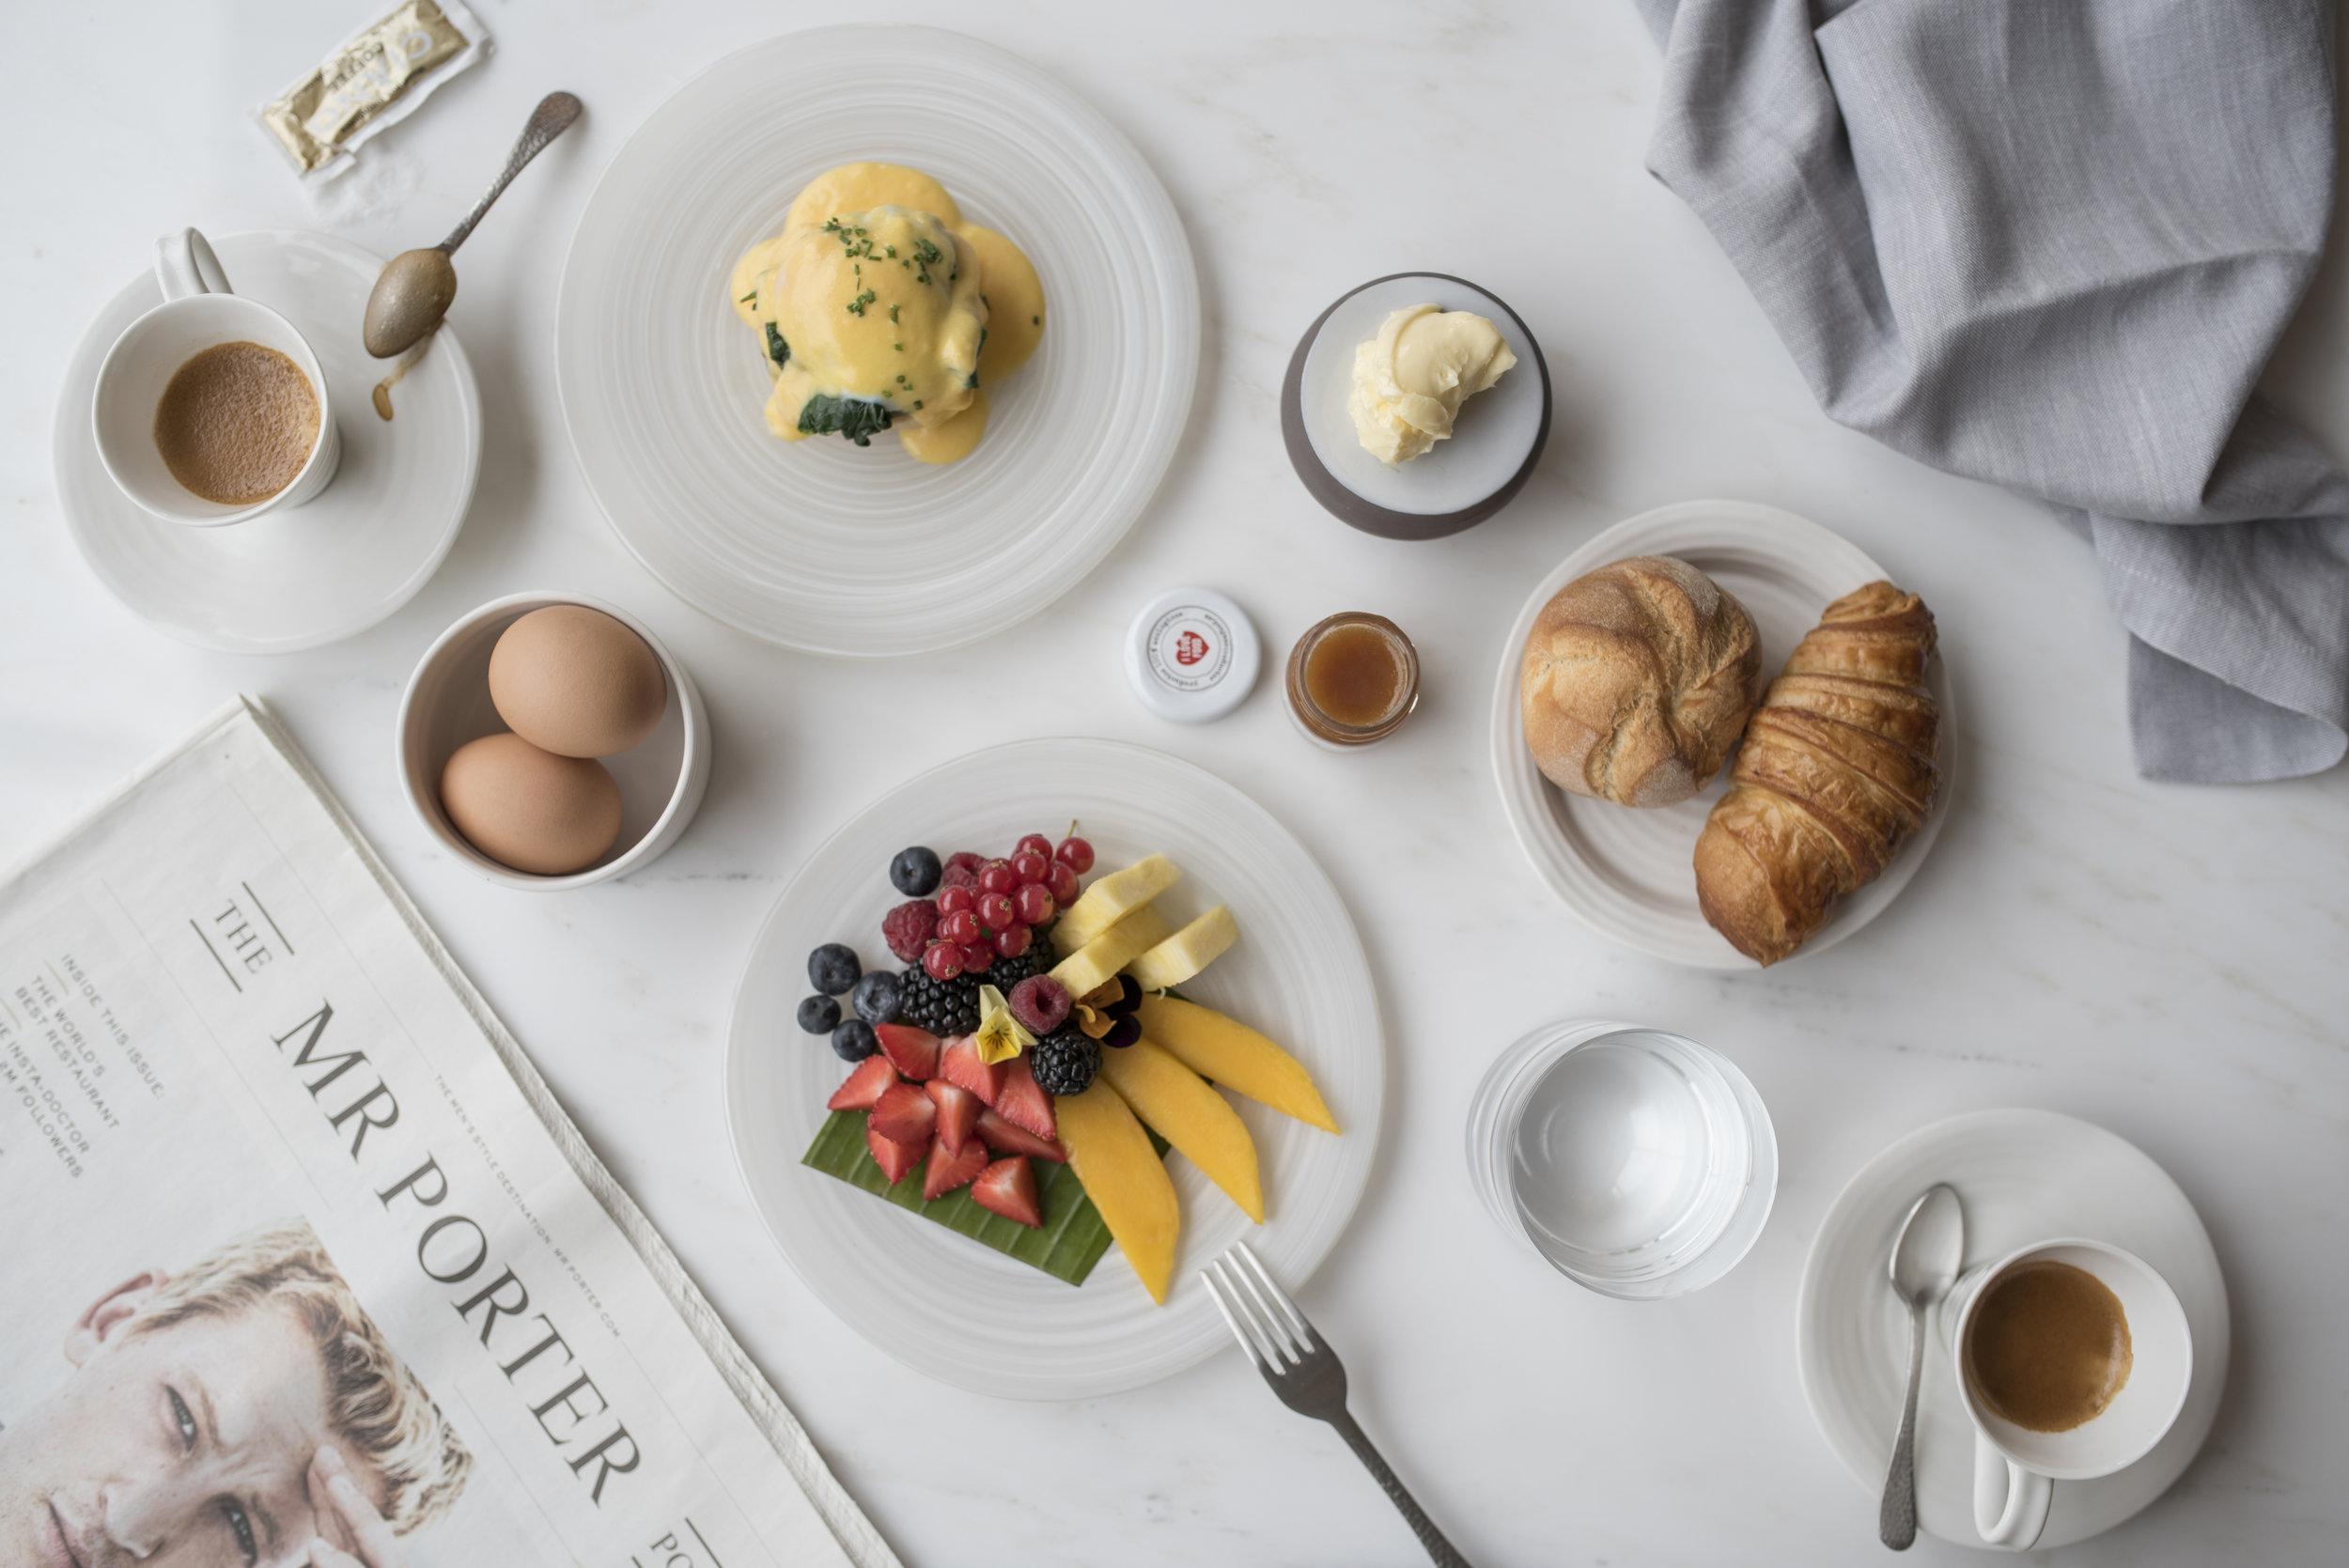 Breakfast-almanac-hotel-barcelona.jpg